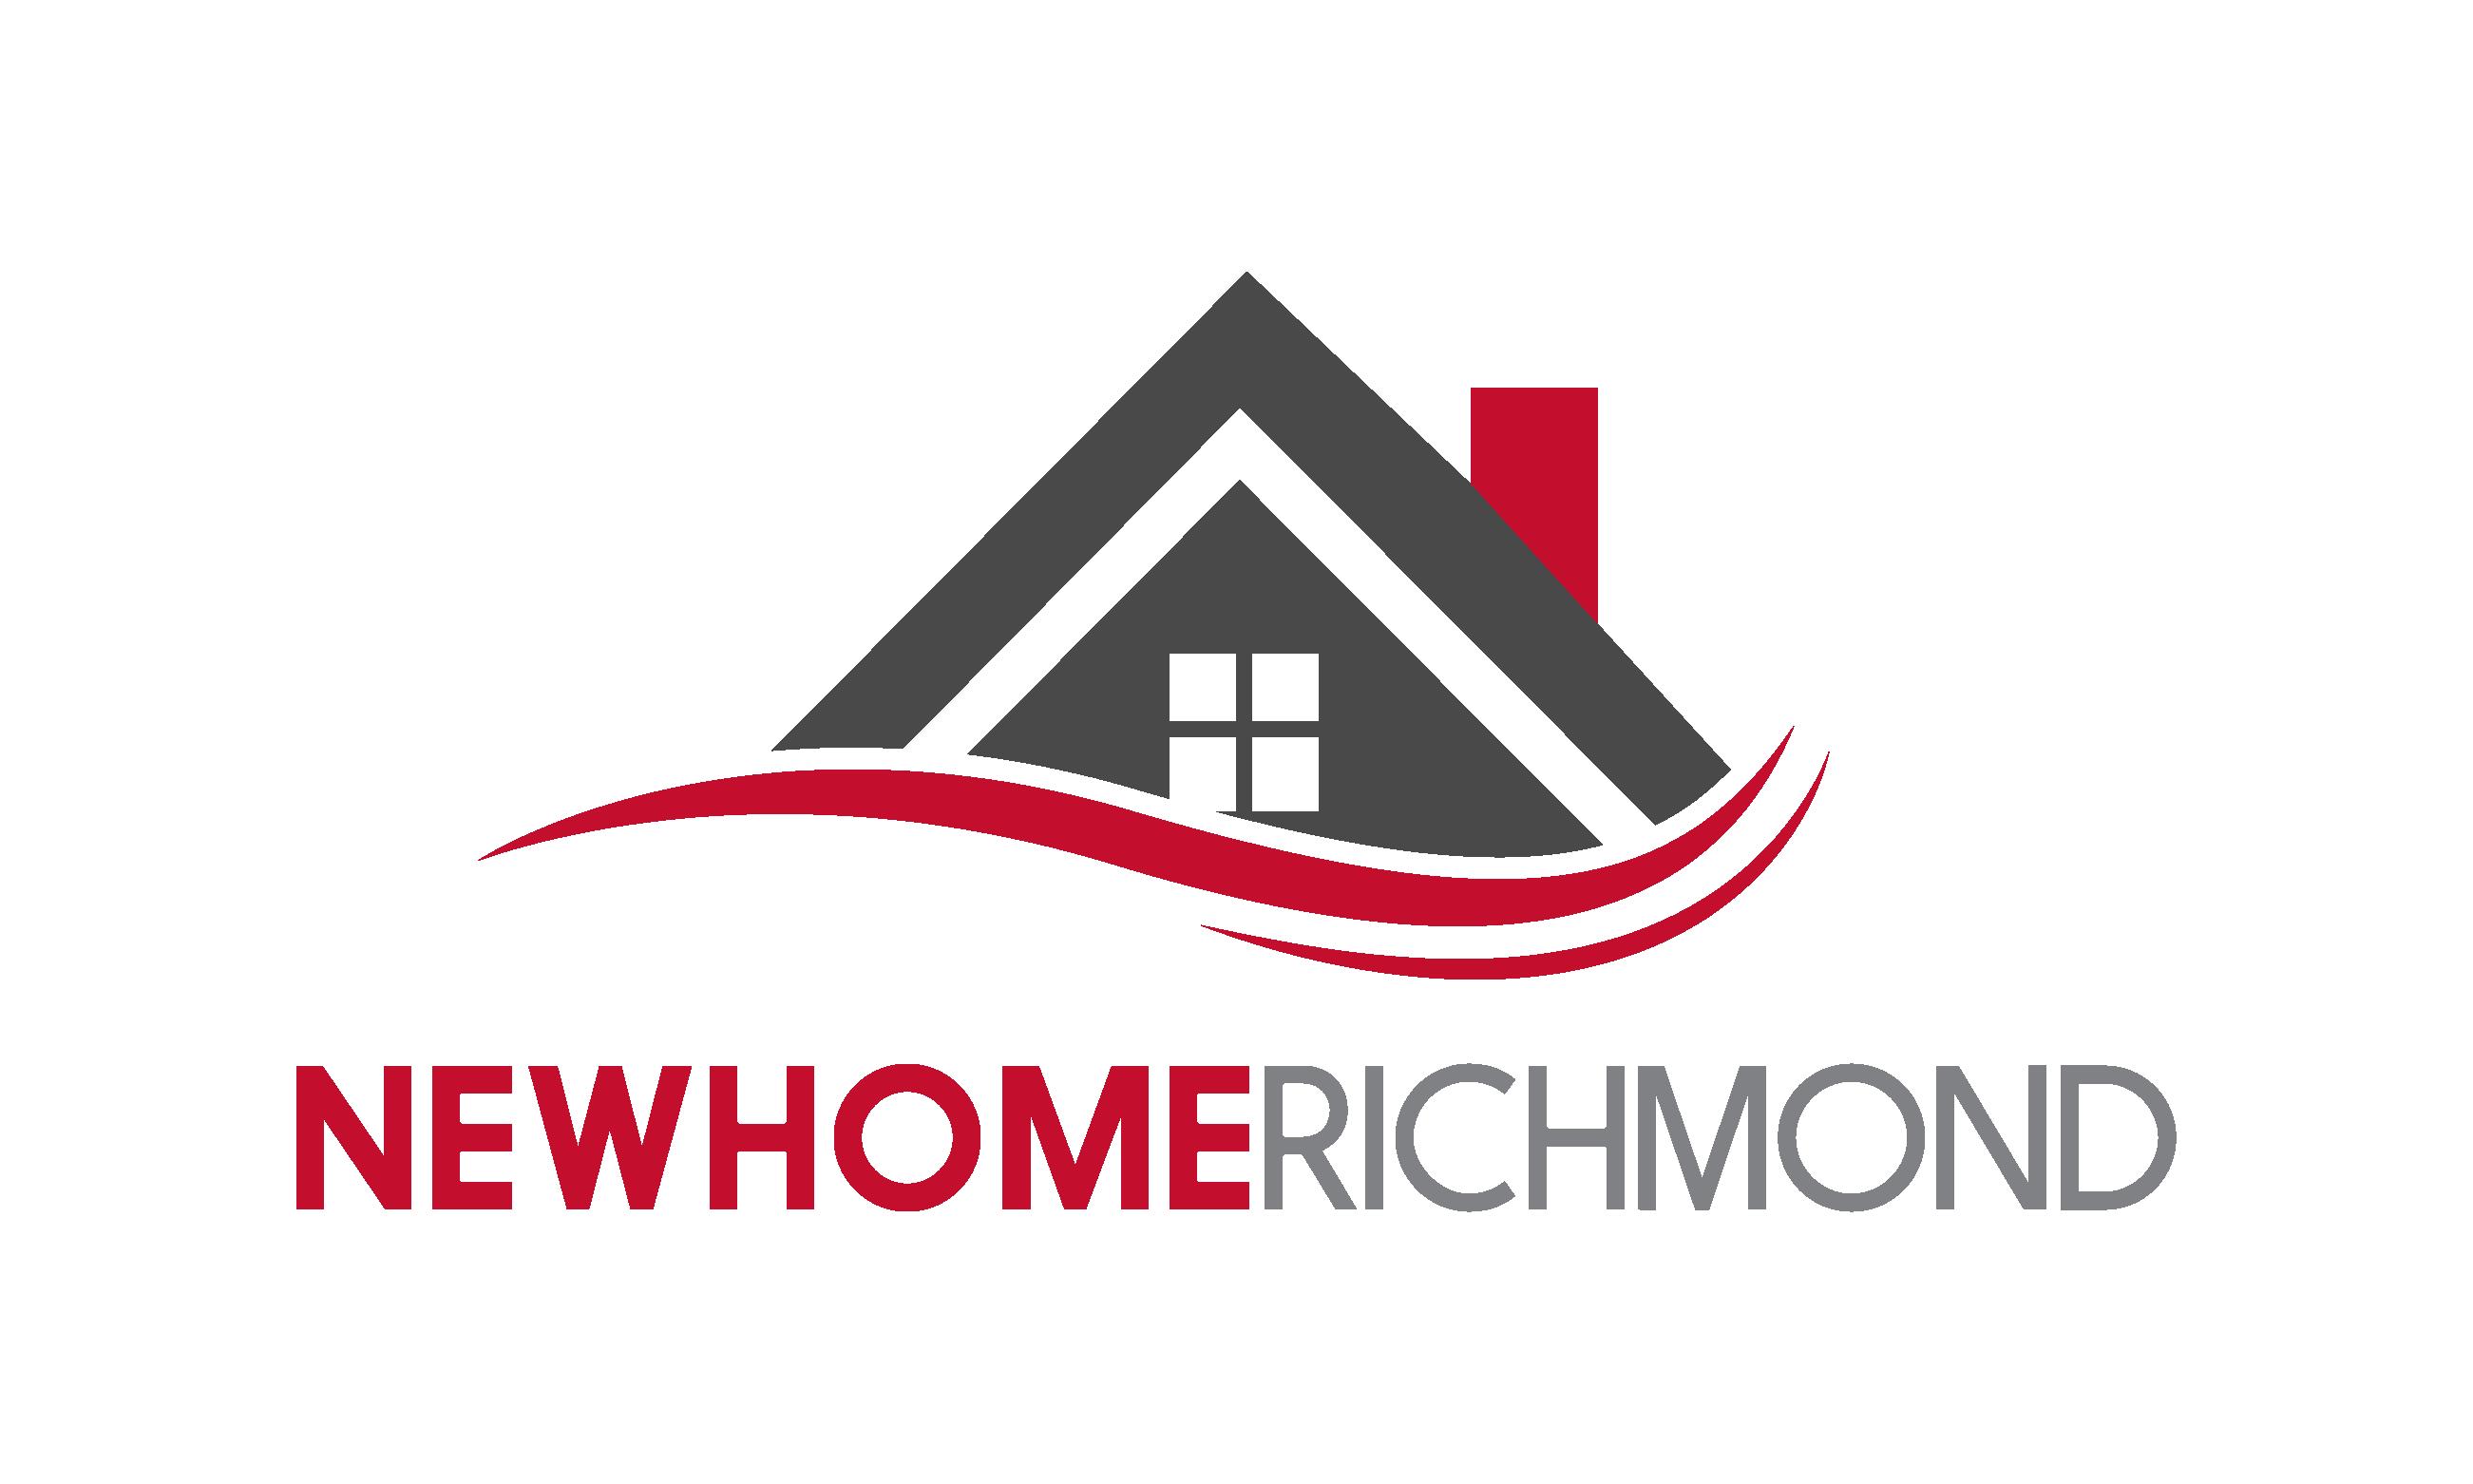 New Home Richmond